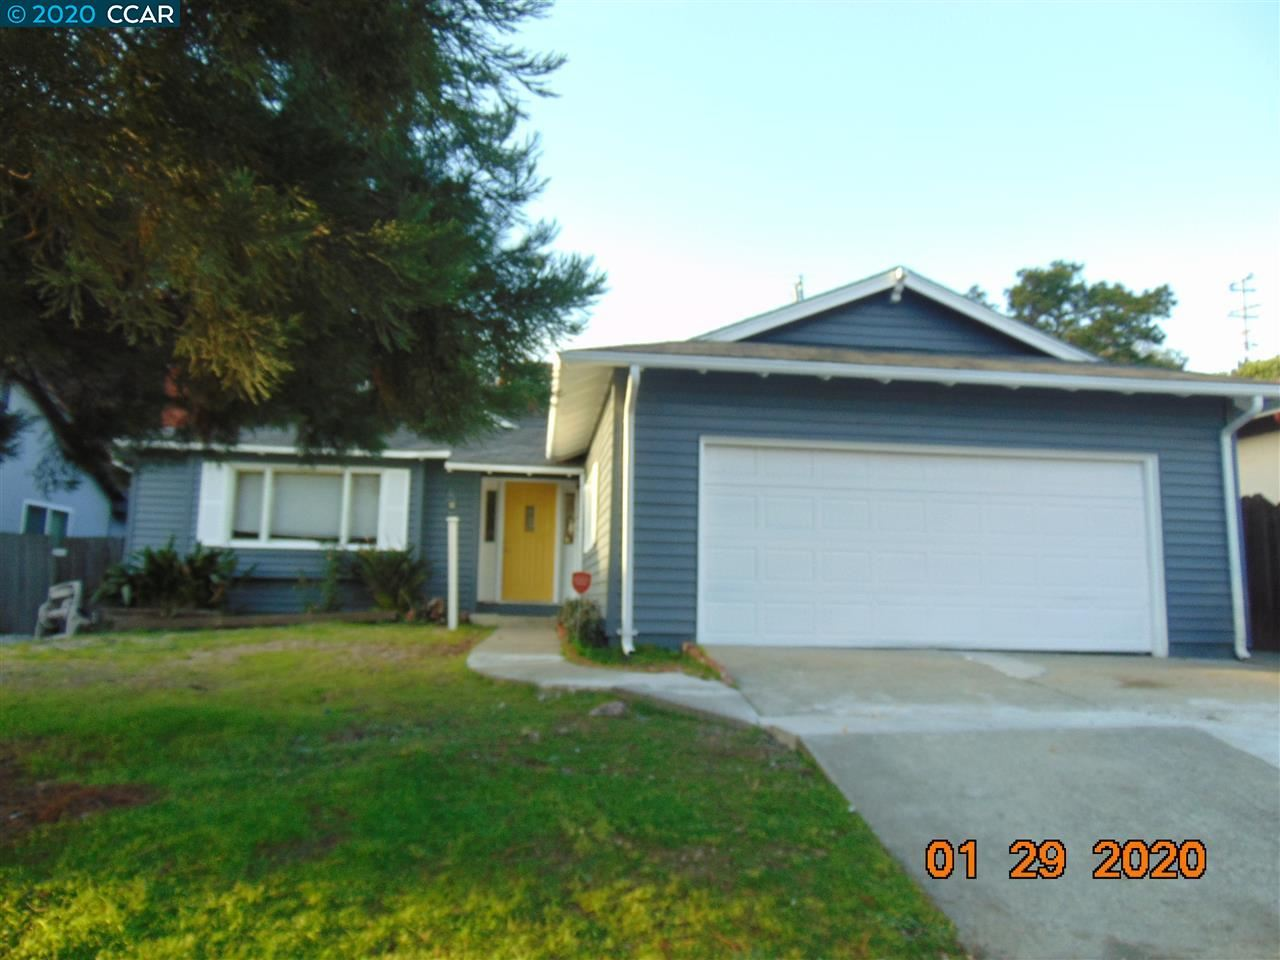 Photo for 2901 Canterbury Dr, RICHMOND, CA 94806 (MLS # 40895407)